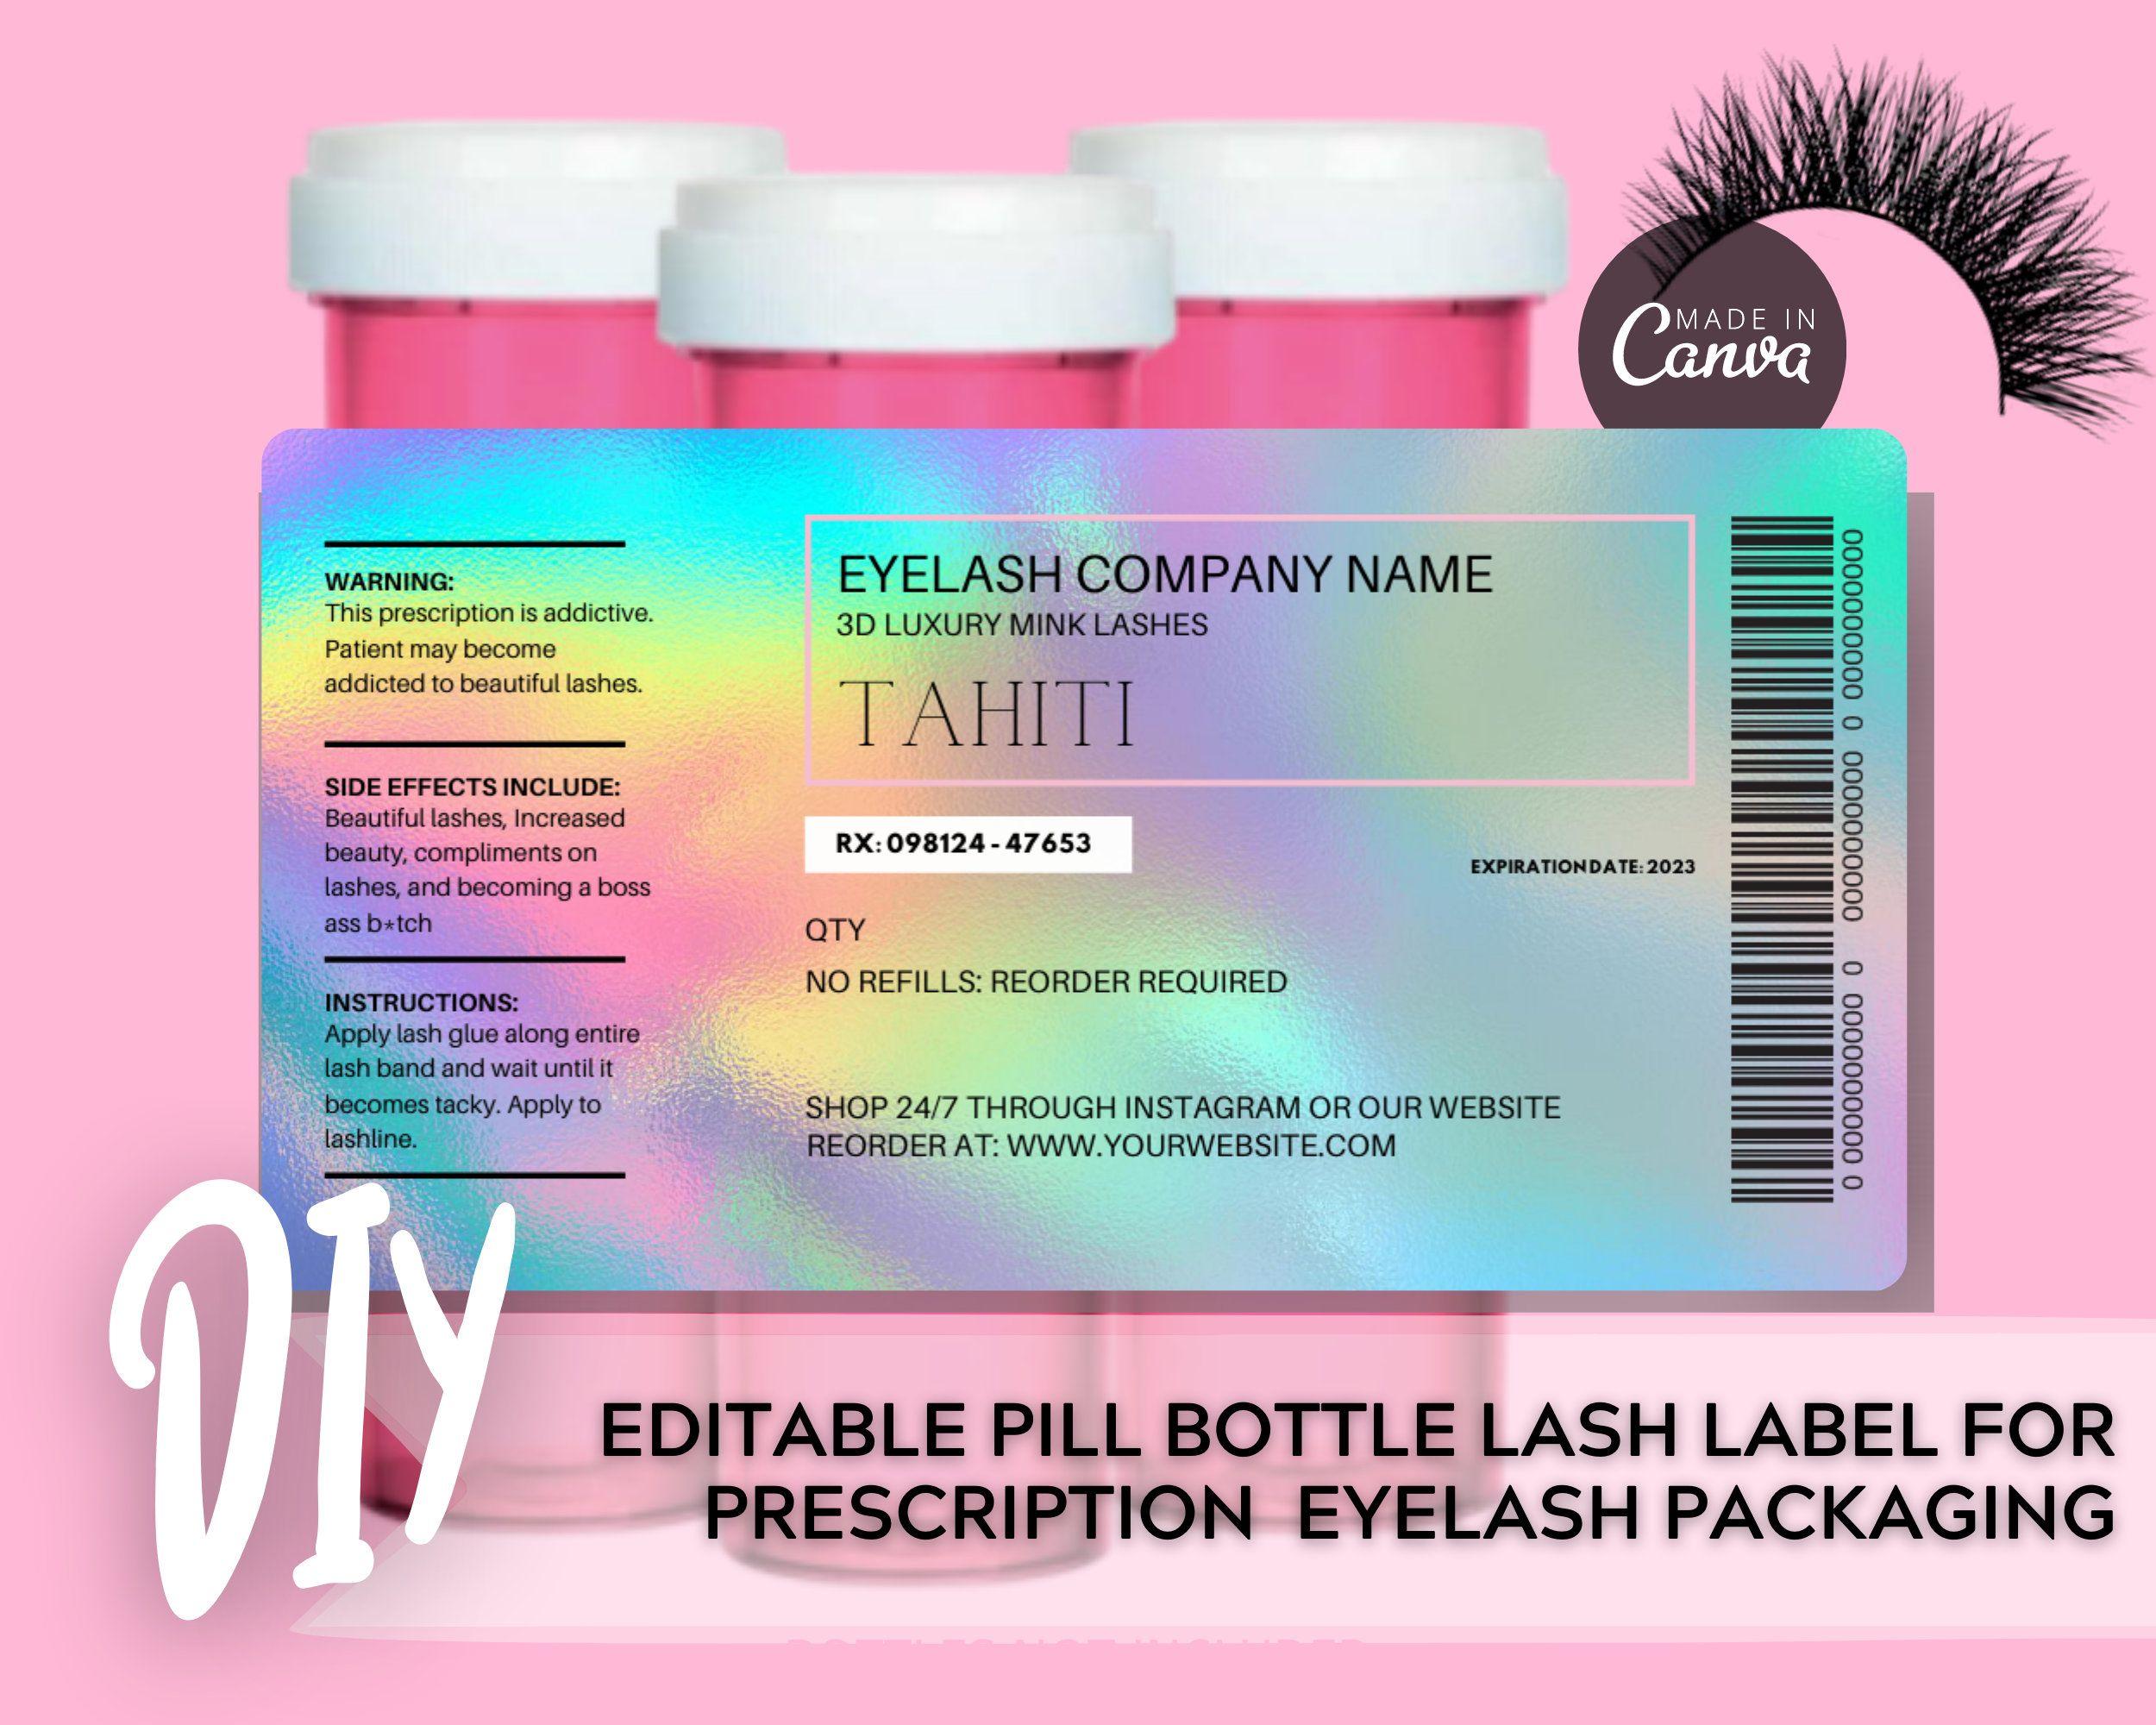 Diy Pill Bottle Lash Label Holographic Template Prescription Etsy Pill Bottles Labels Digital Labels Prescription pill bottle label templates